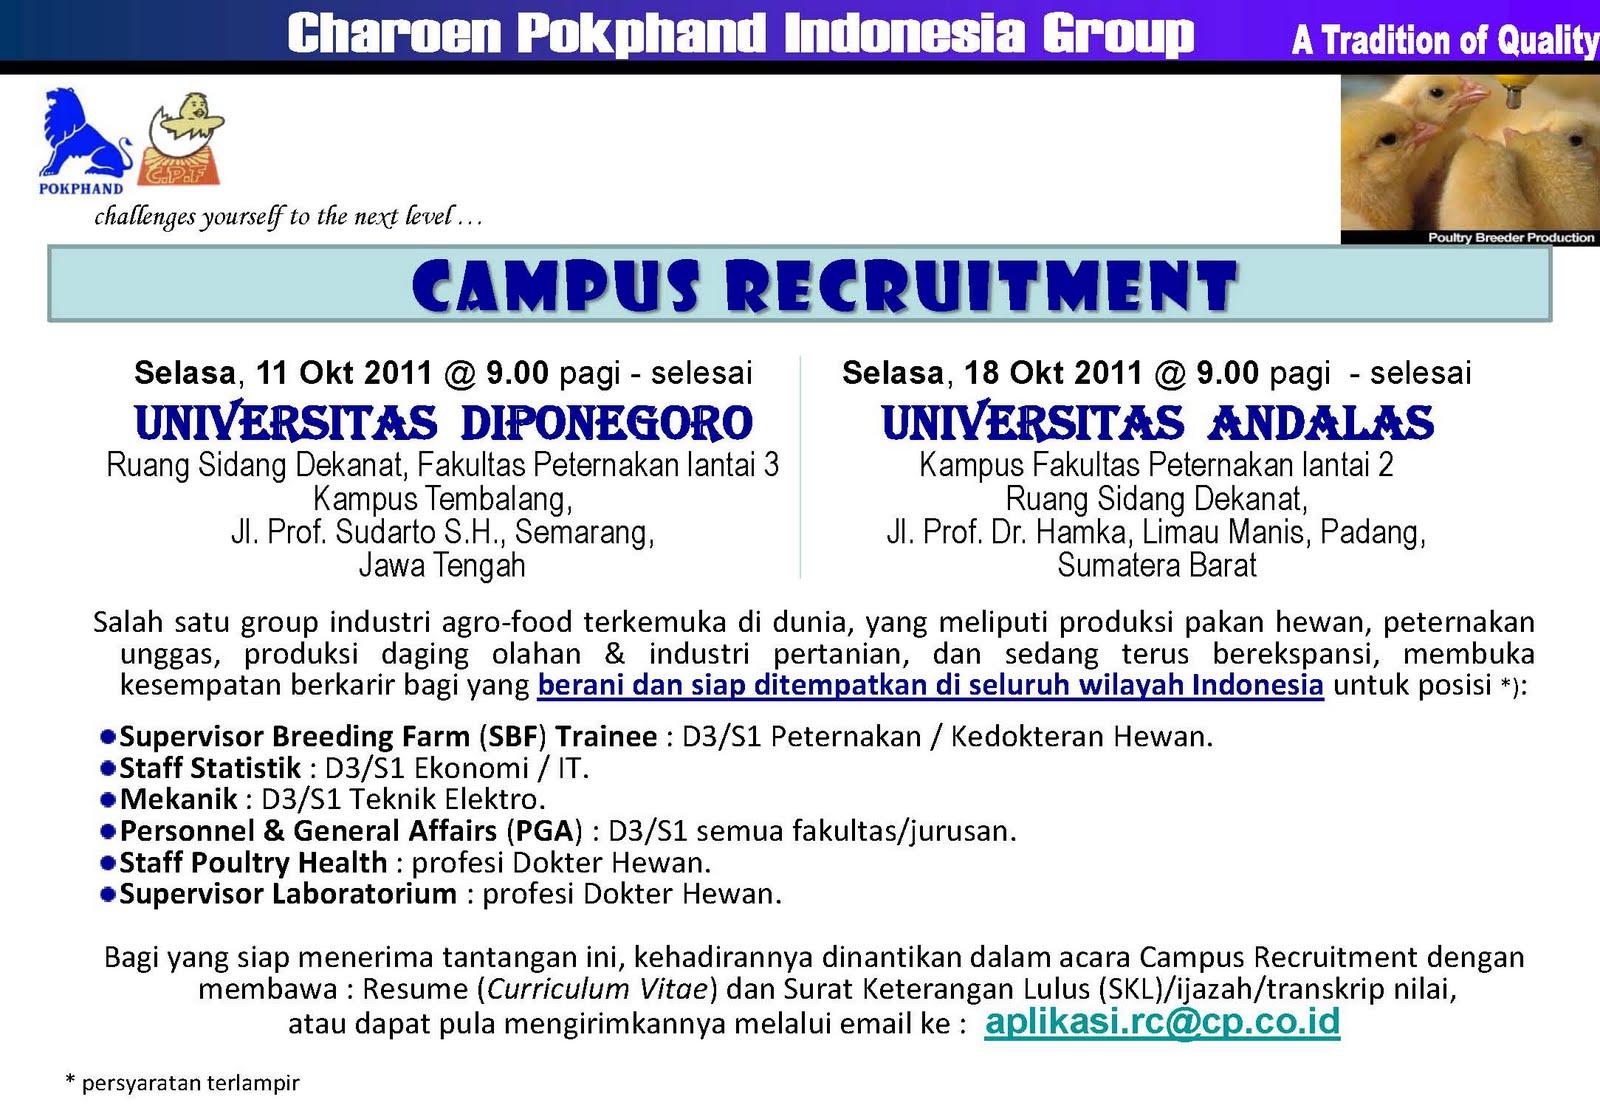 Lowongan 2013 Pt Konimex Lowongan Kerja Di Pt Air Mineral Wahaha Sukoharjo Charoen Pokphand Group Indonesia Career Development Center Cdc Uns